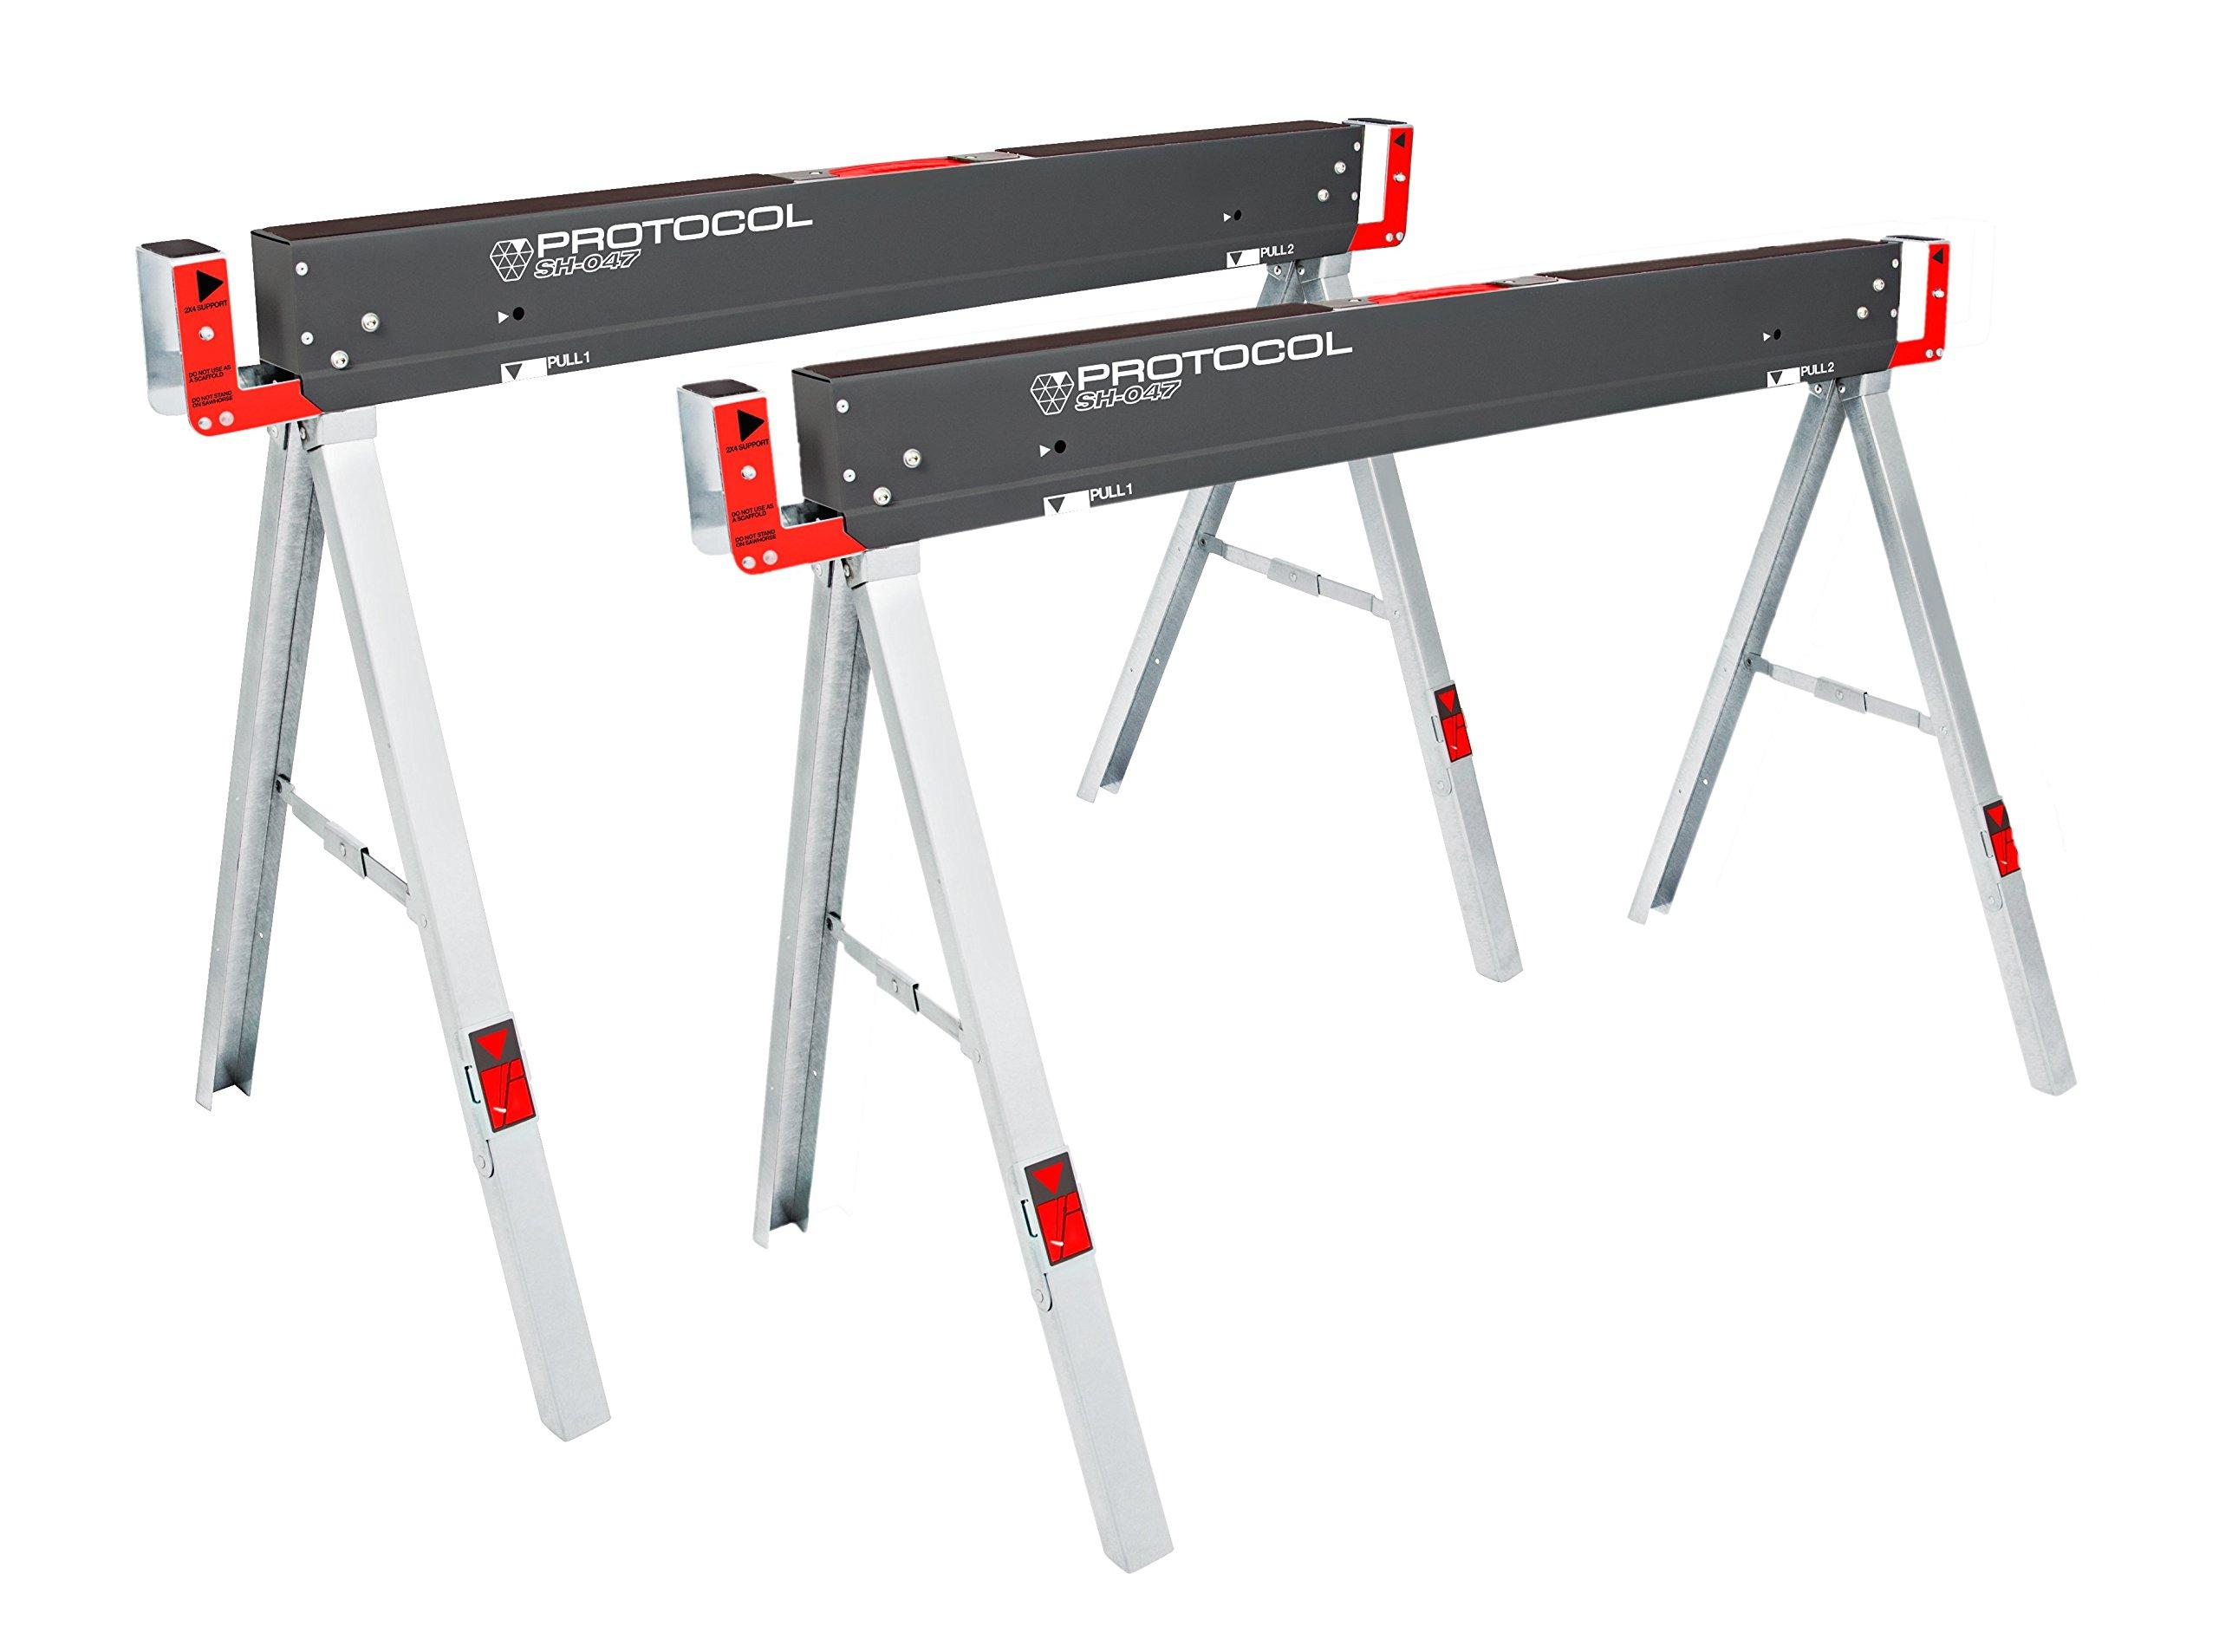 PROTOCOL Equipment 92785 Work Table Folding Sawhorse, Set of 2